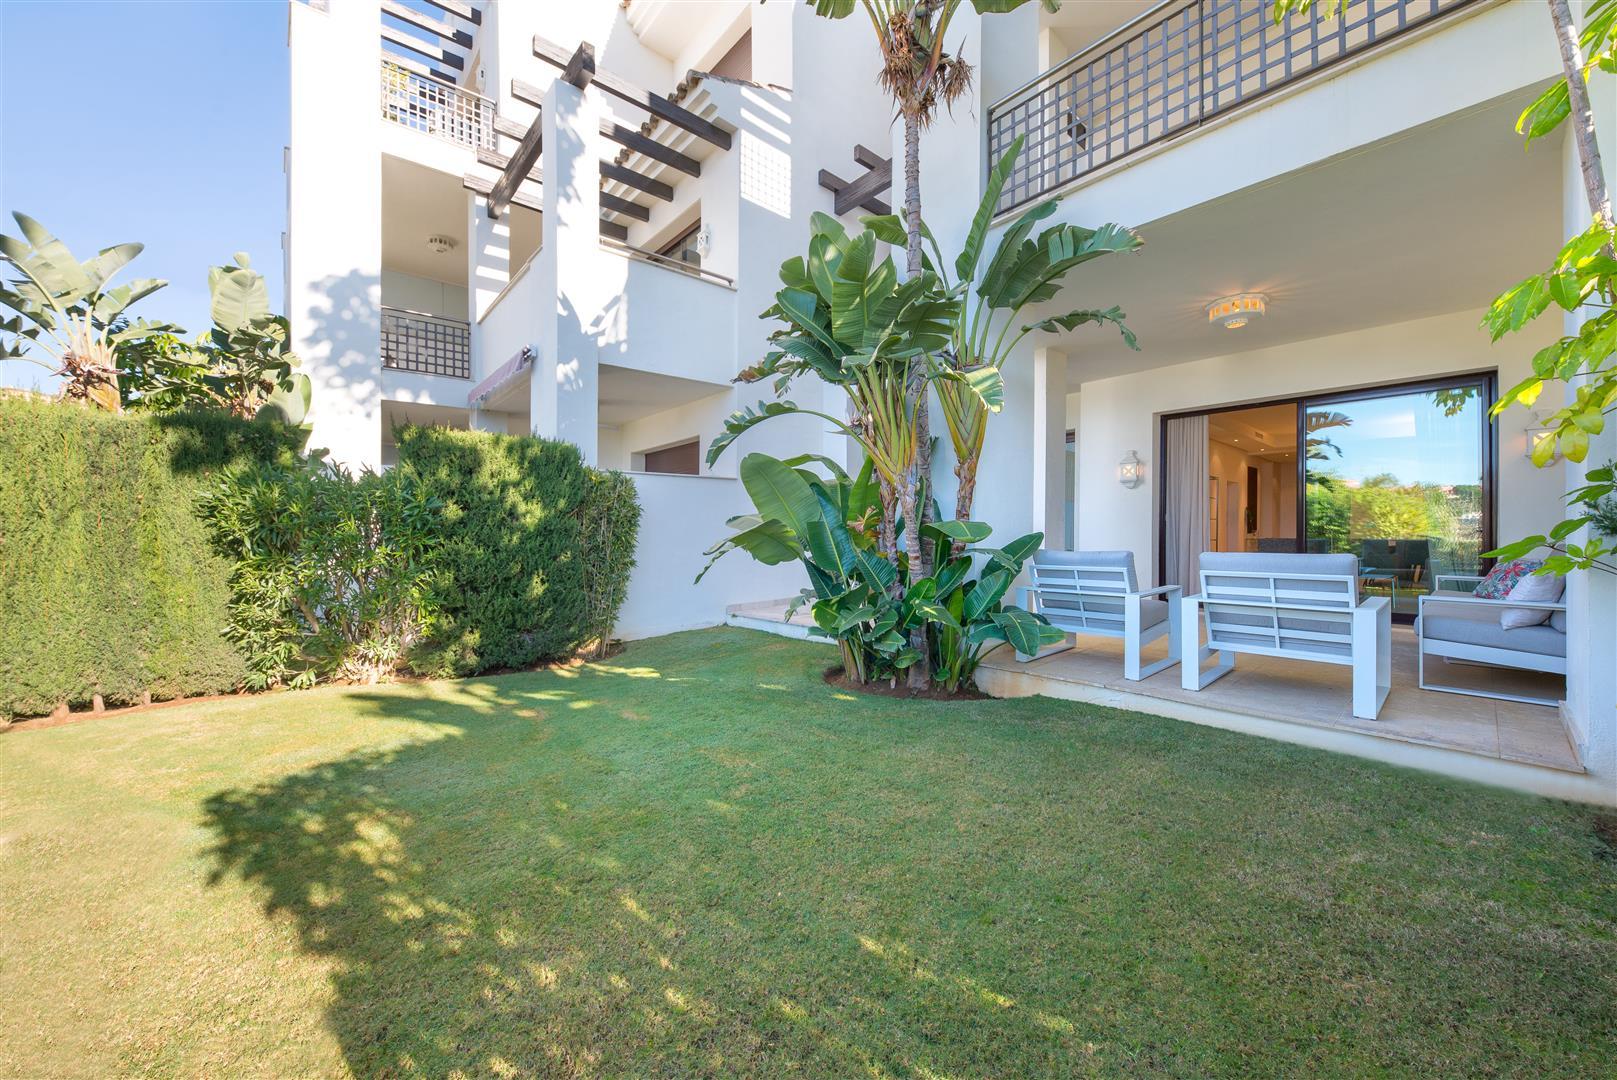 Furnished ground floor apartment with garden Benahavis